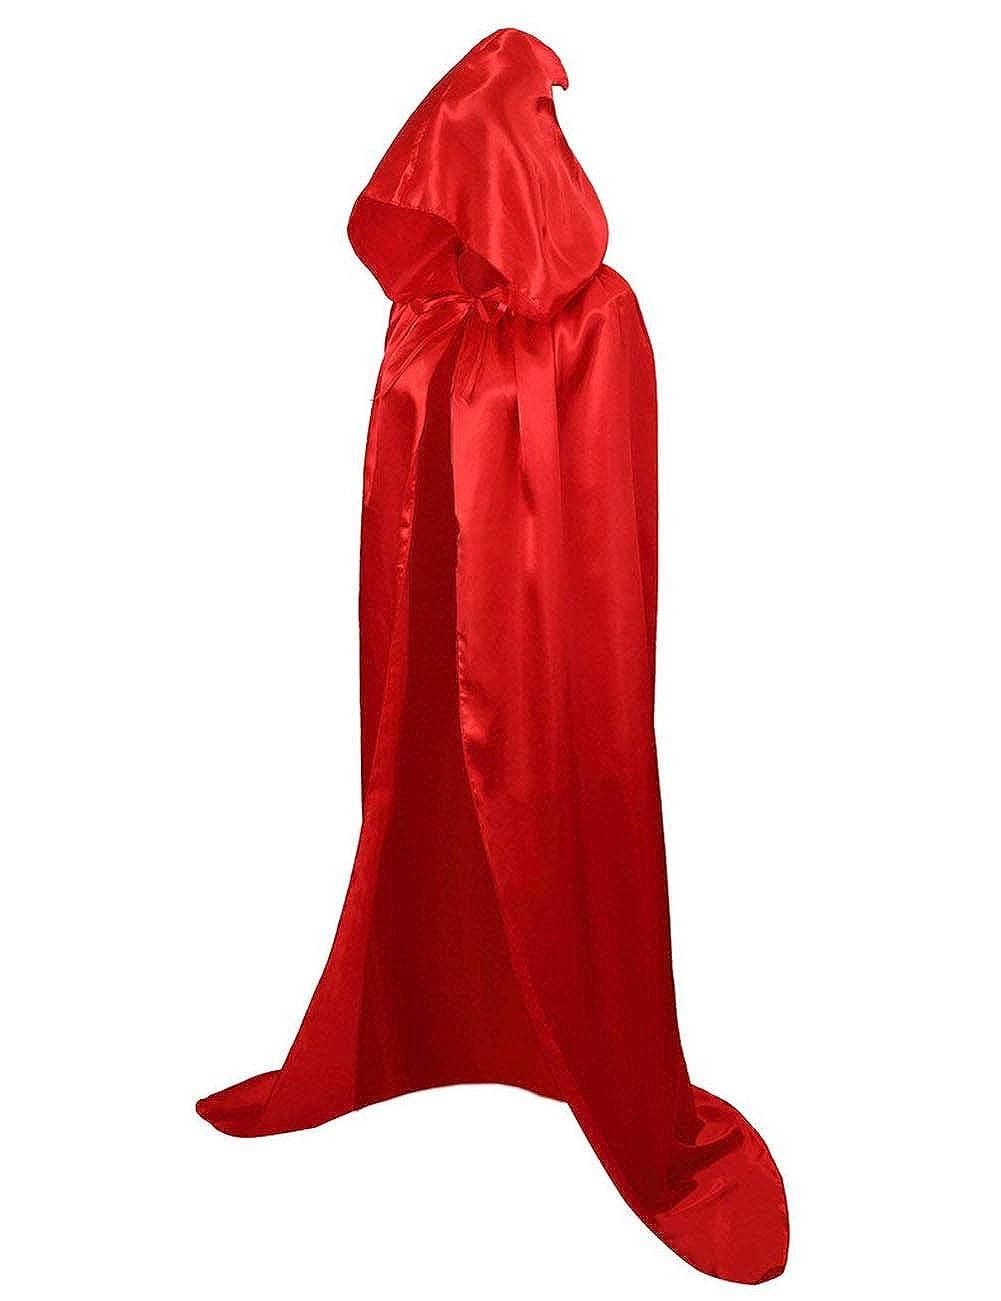 GRACIN Unisex Halloween Hooded Cloak, Full Length Robe Cape for Cosplay Costume Party Black)